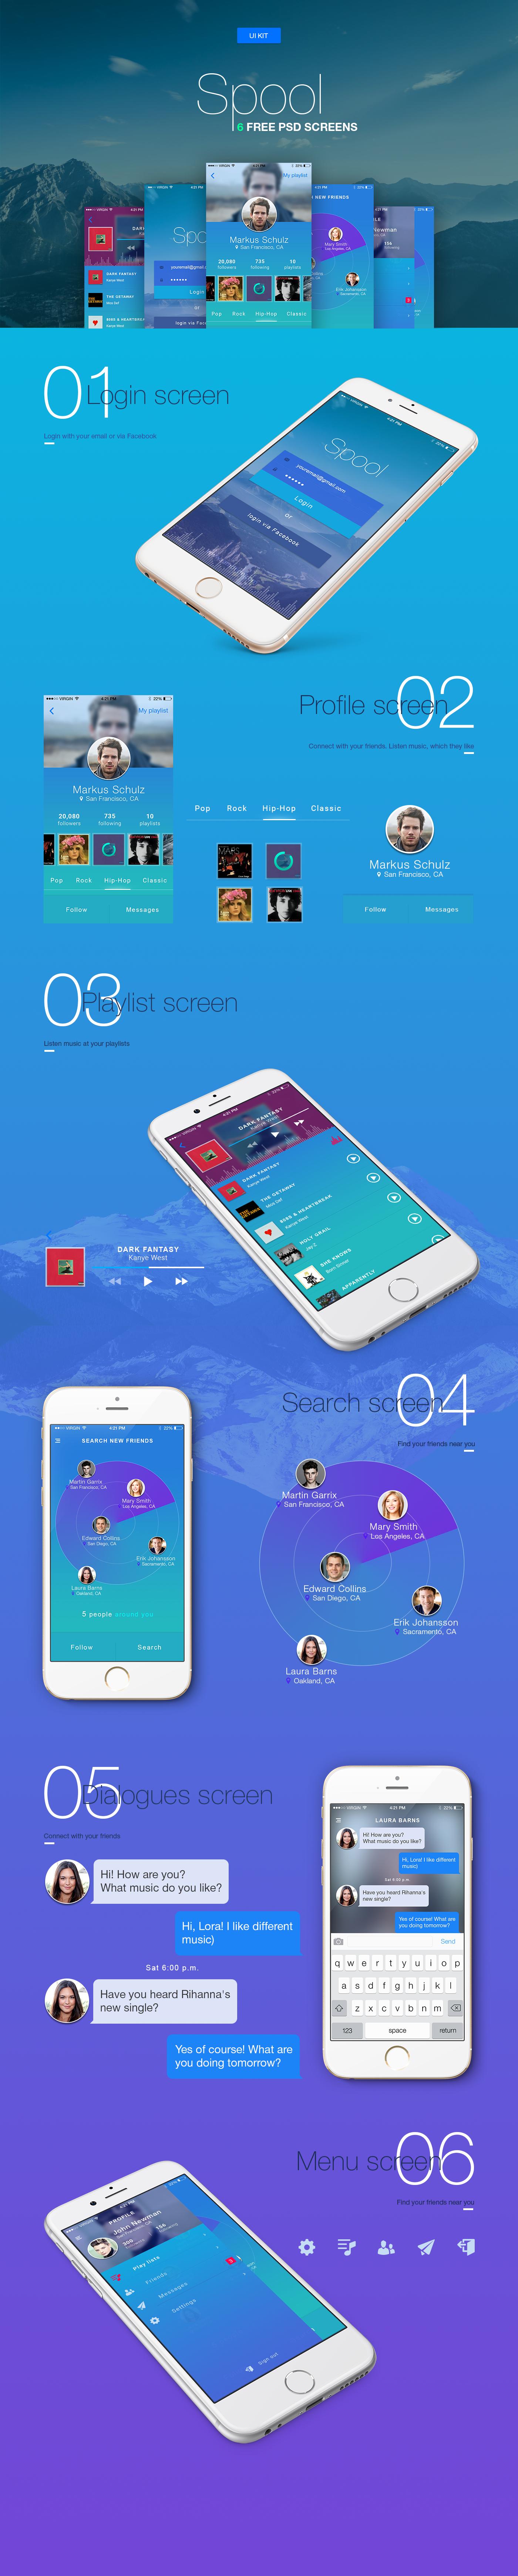 free UI kit ui kit psd free psd uikit screen app application Free App